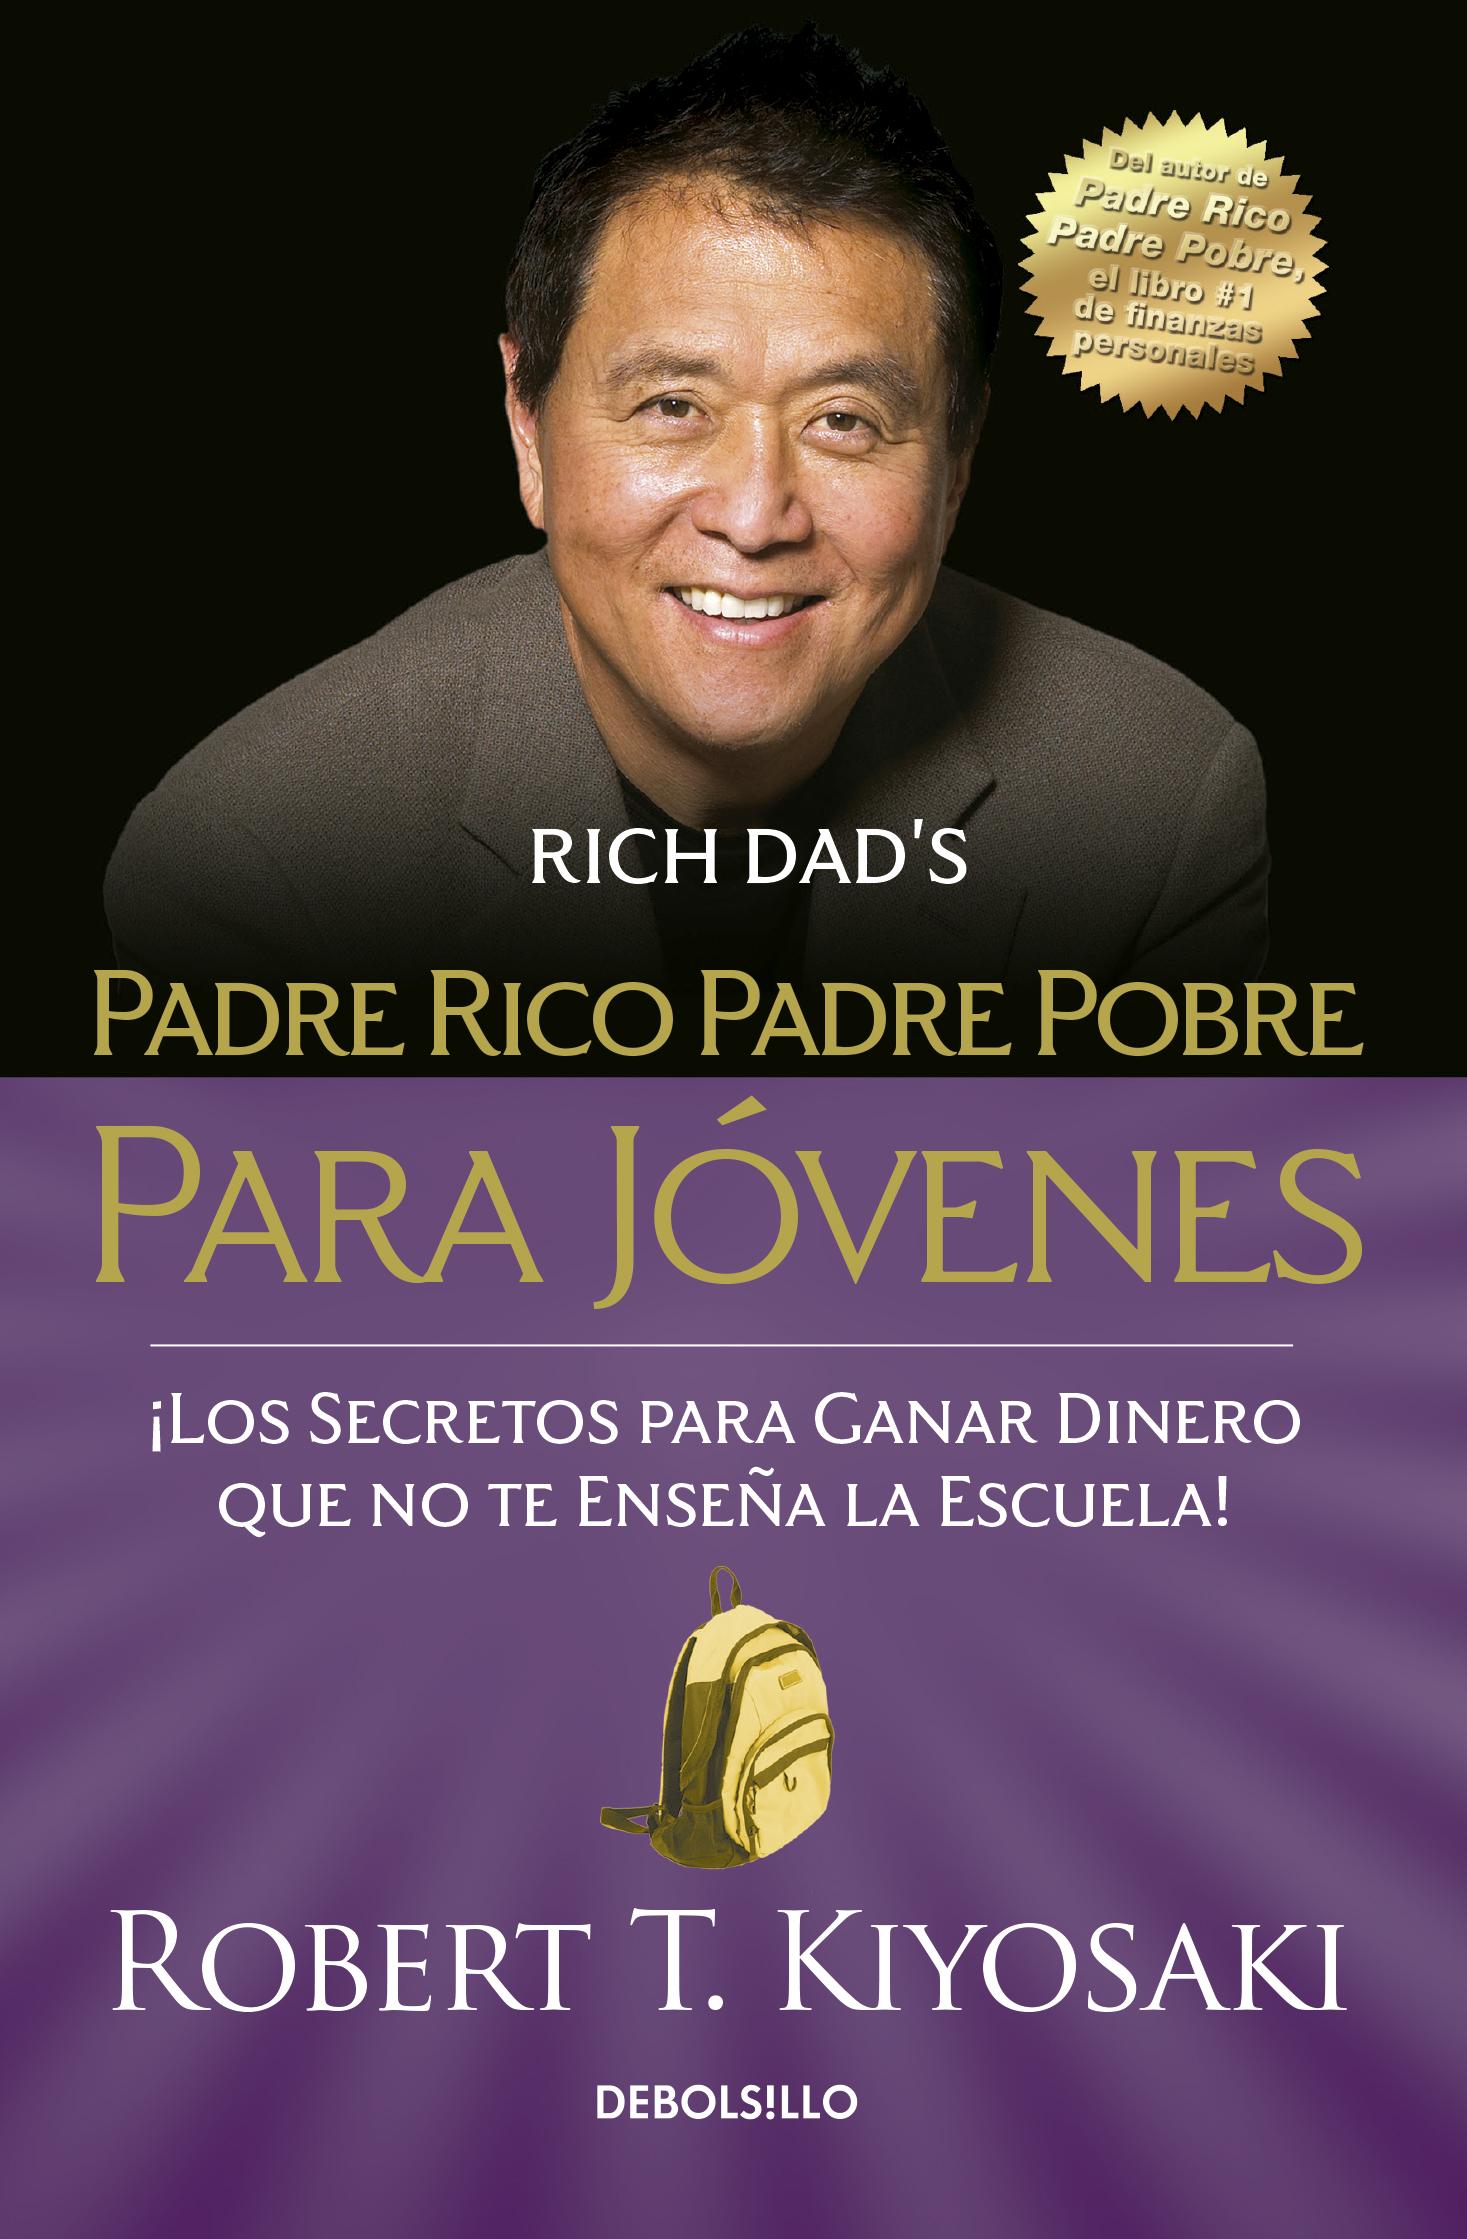 PADRE RICO PADRE POBRE PARA JóVENES (PADRE RICO)